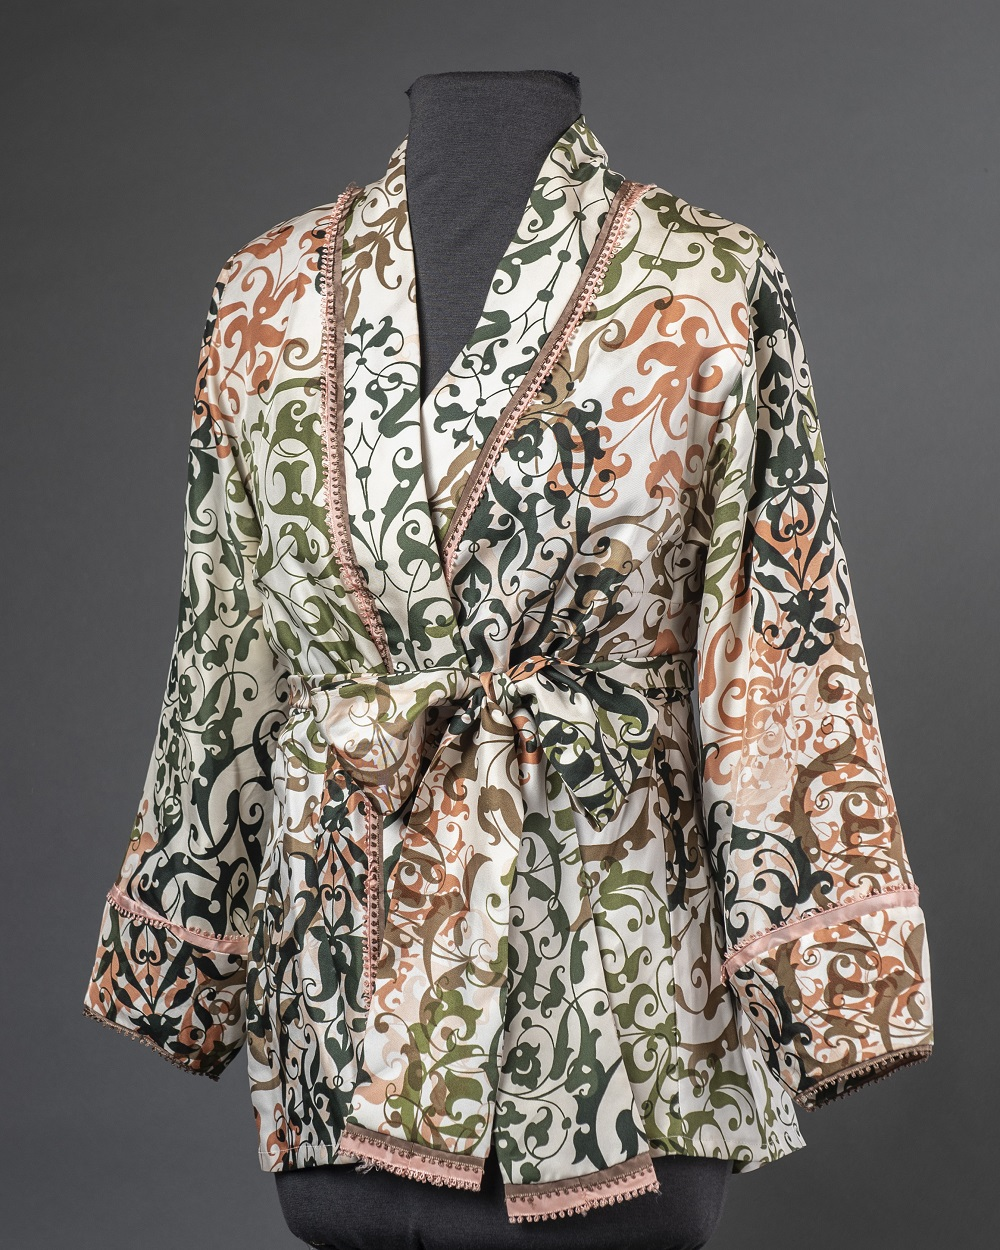 Sarah's sashed blouse